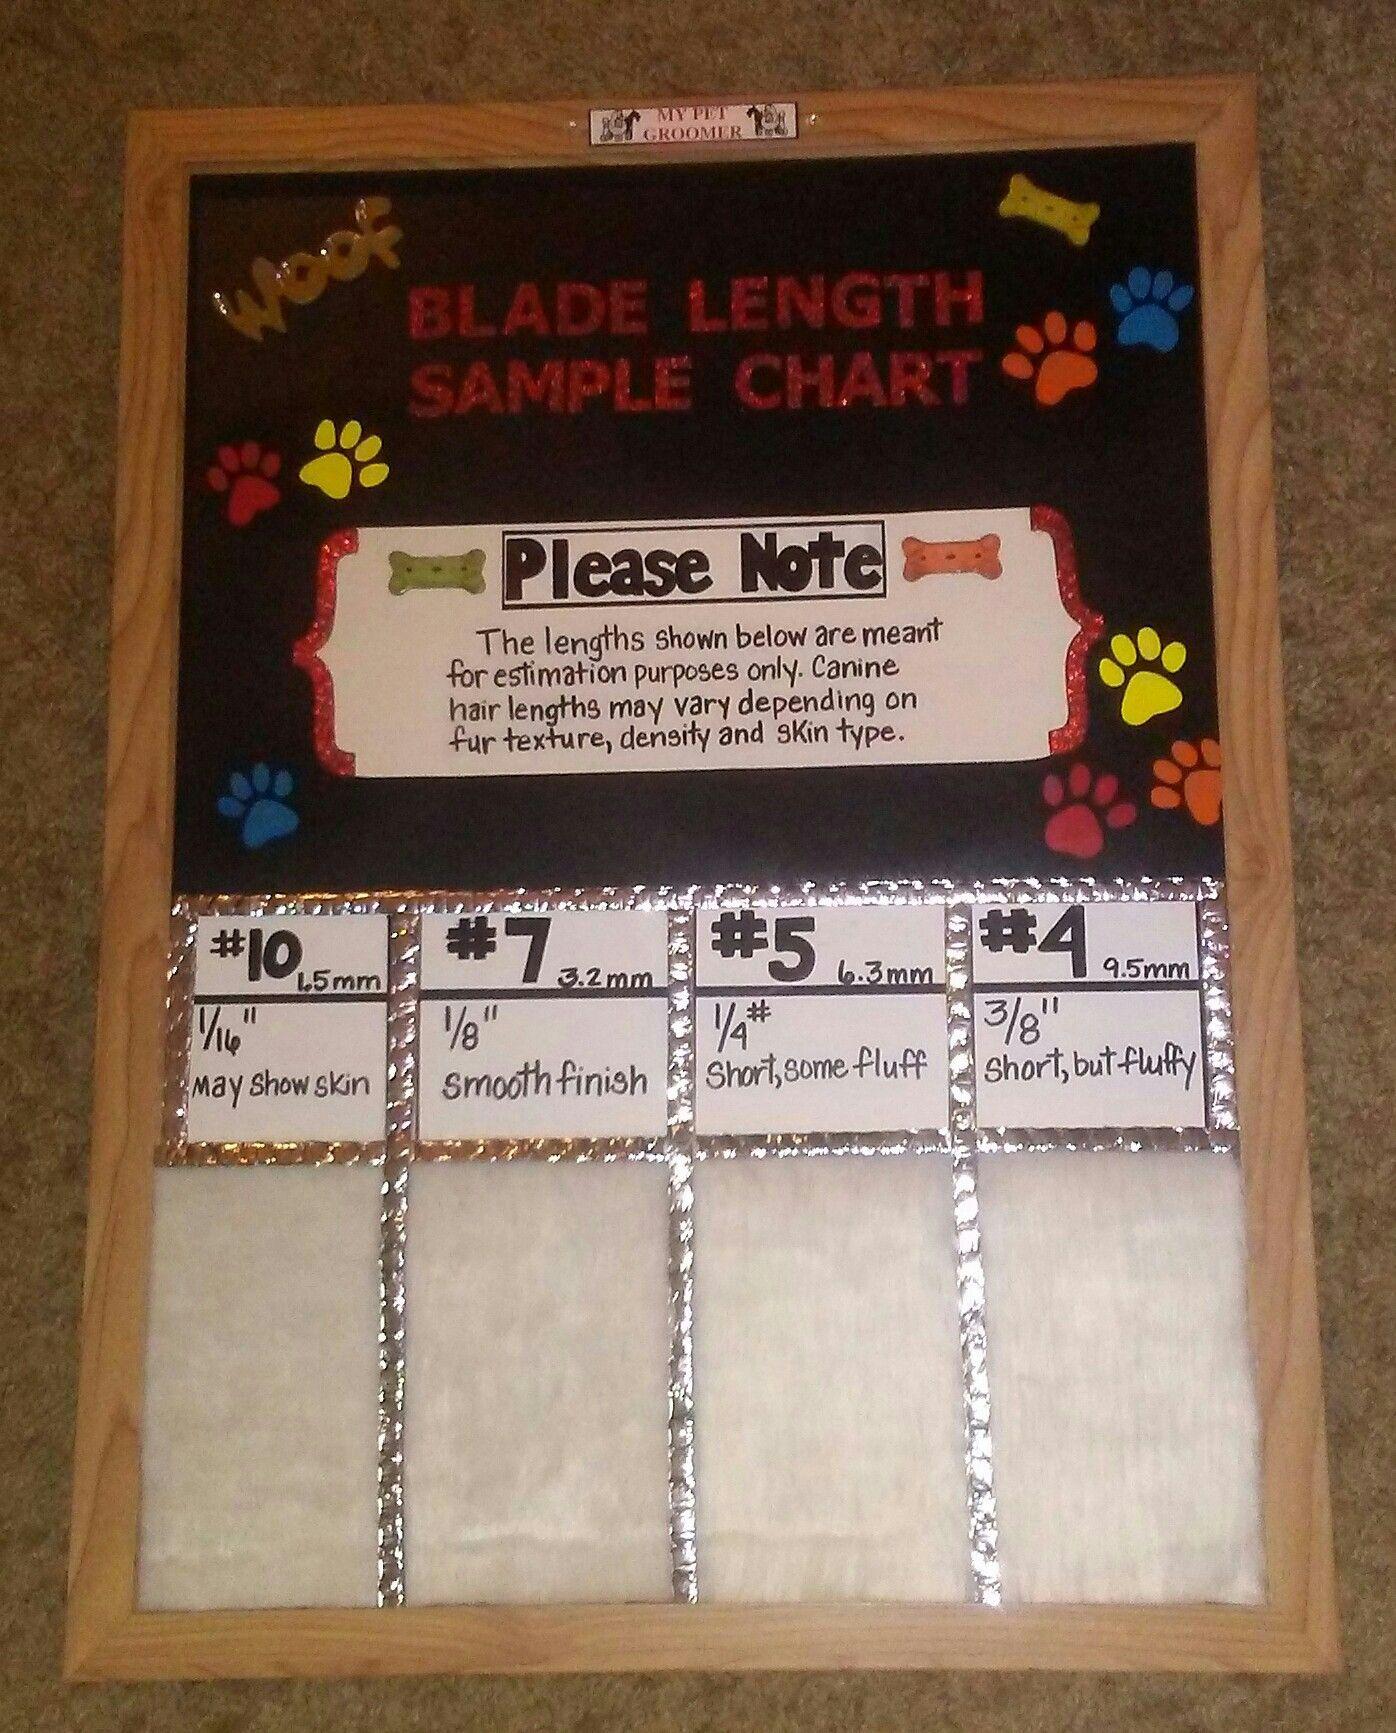 Blade Length Sample Chart For Dog Grooming Dog Grooming Shop Dog Grooming Salons Pet Grooming Business